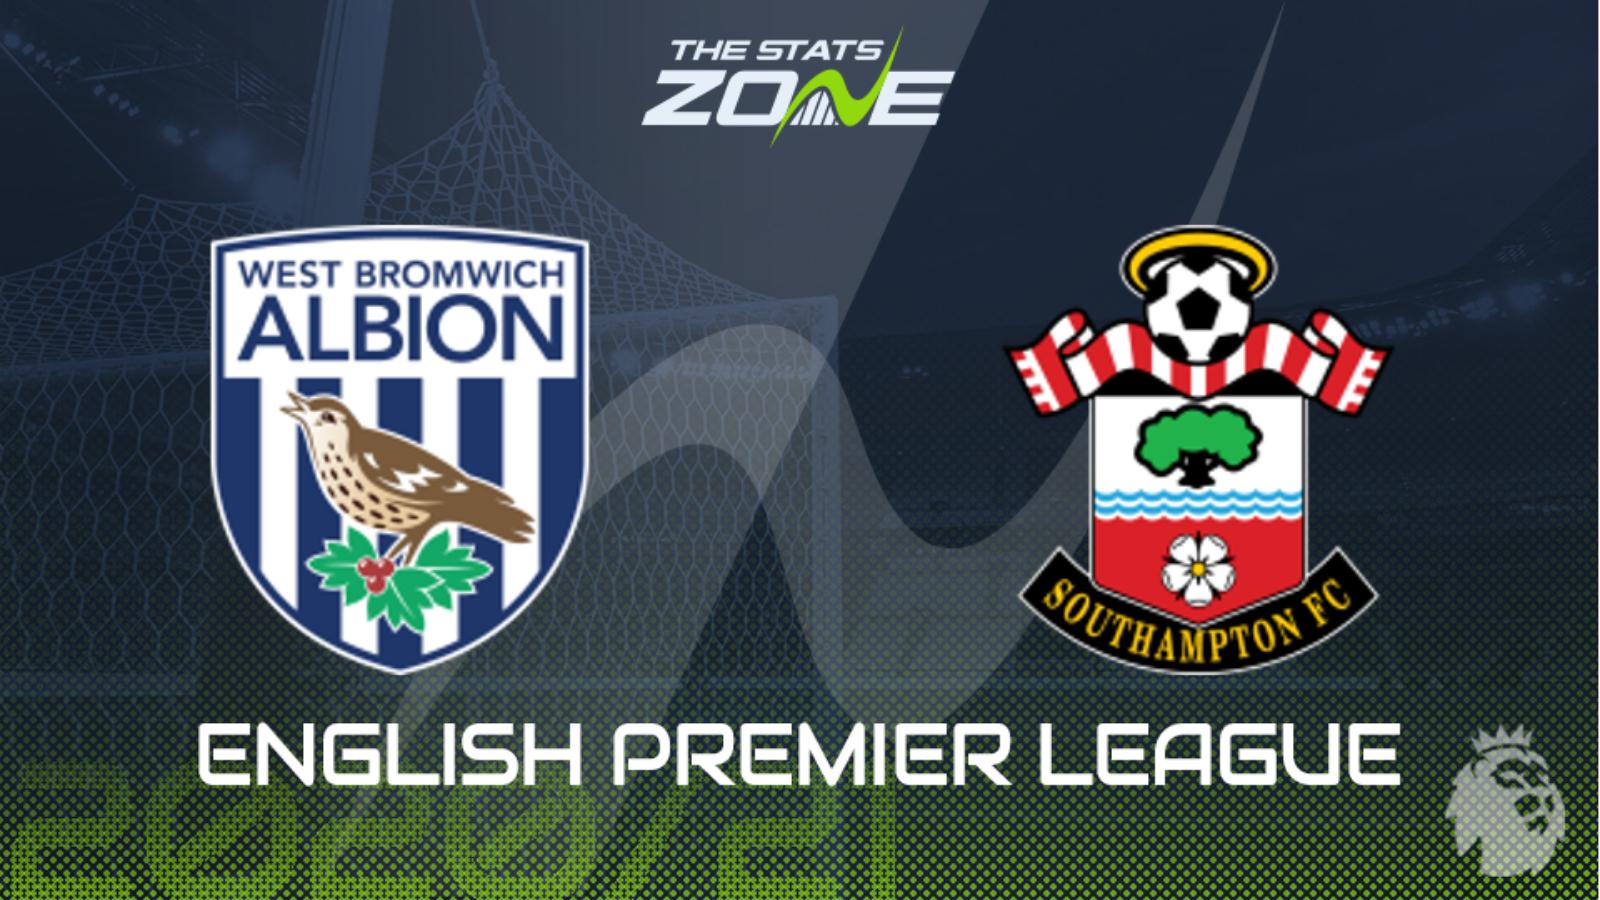 West Brom vs Southampton Highlights – Premier League 2020/21